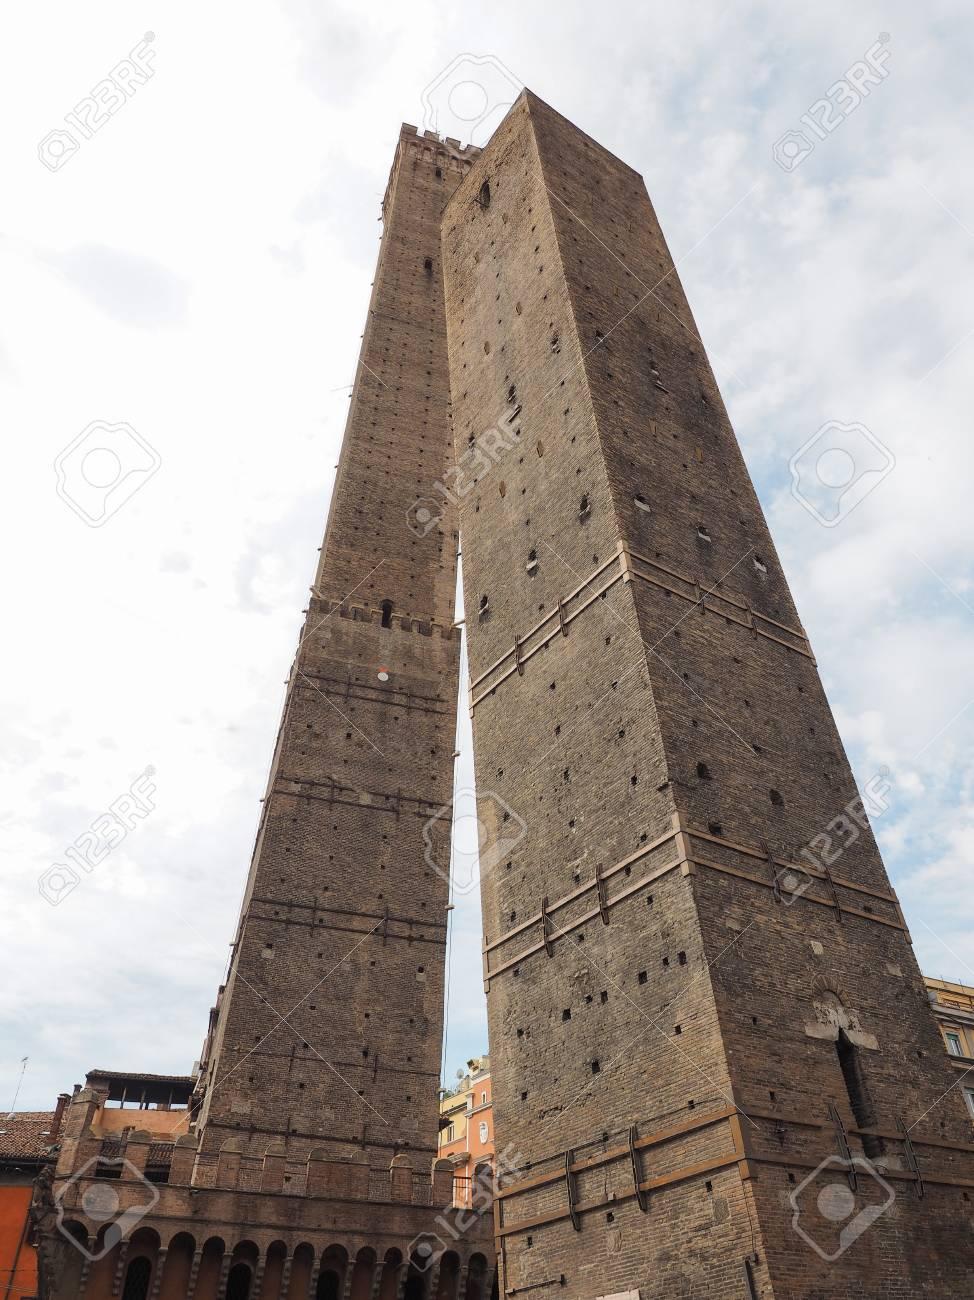 86254203-torre-garisenda-and-torre-degli